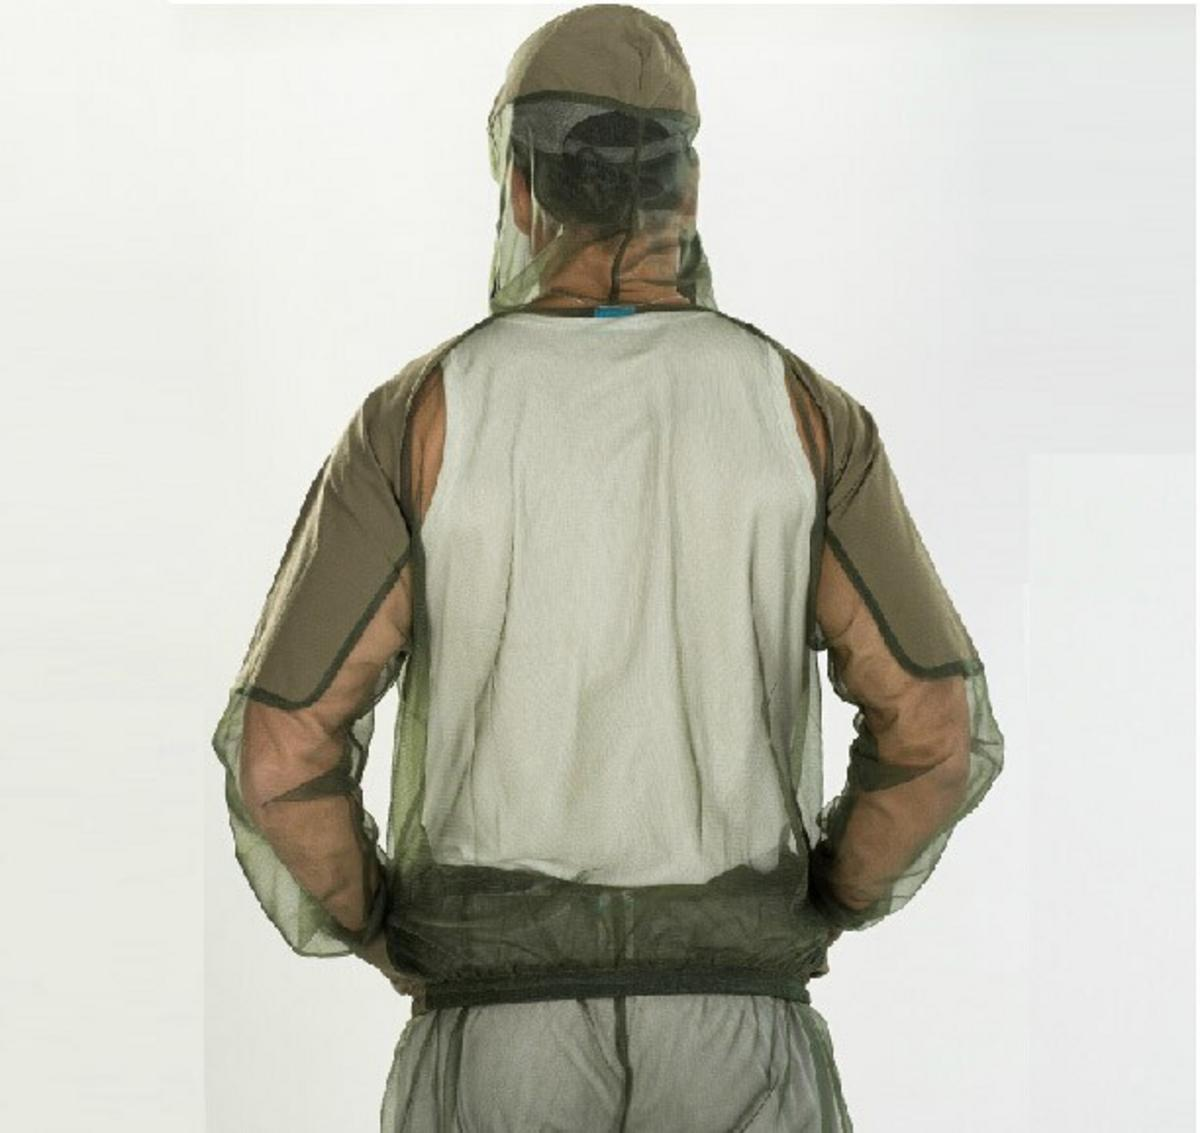 Scotwild Midge Mosquito Suit Complete Protection From